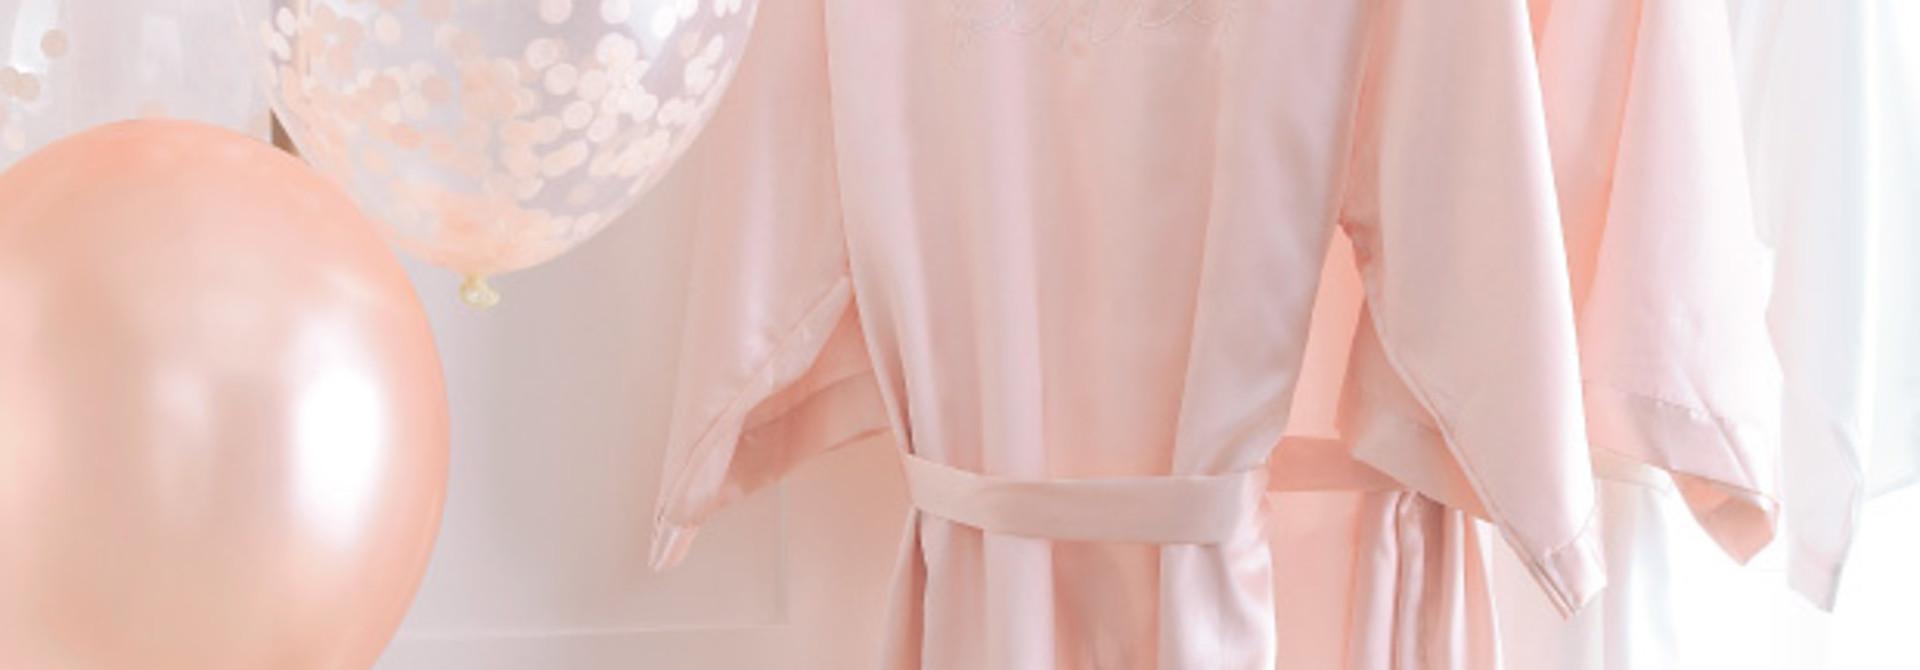 Kimono Brides Bestie Blush Hen Ginger Ray